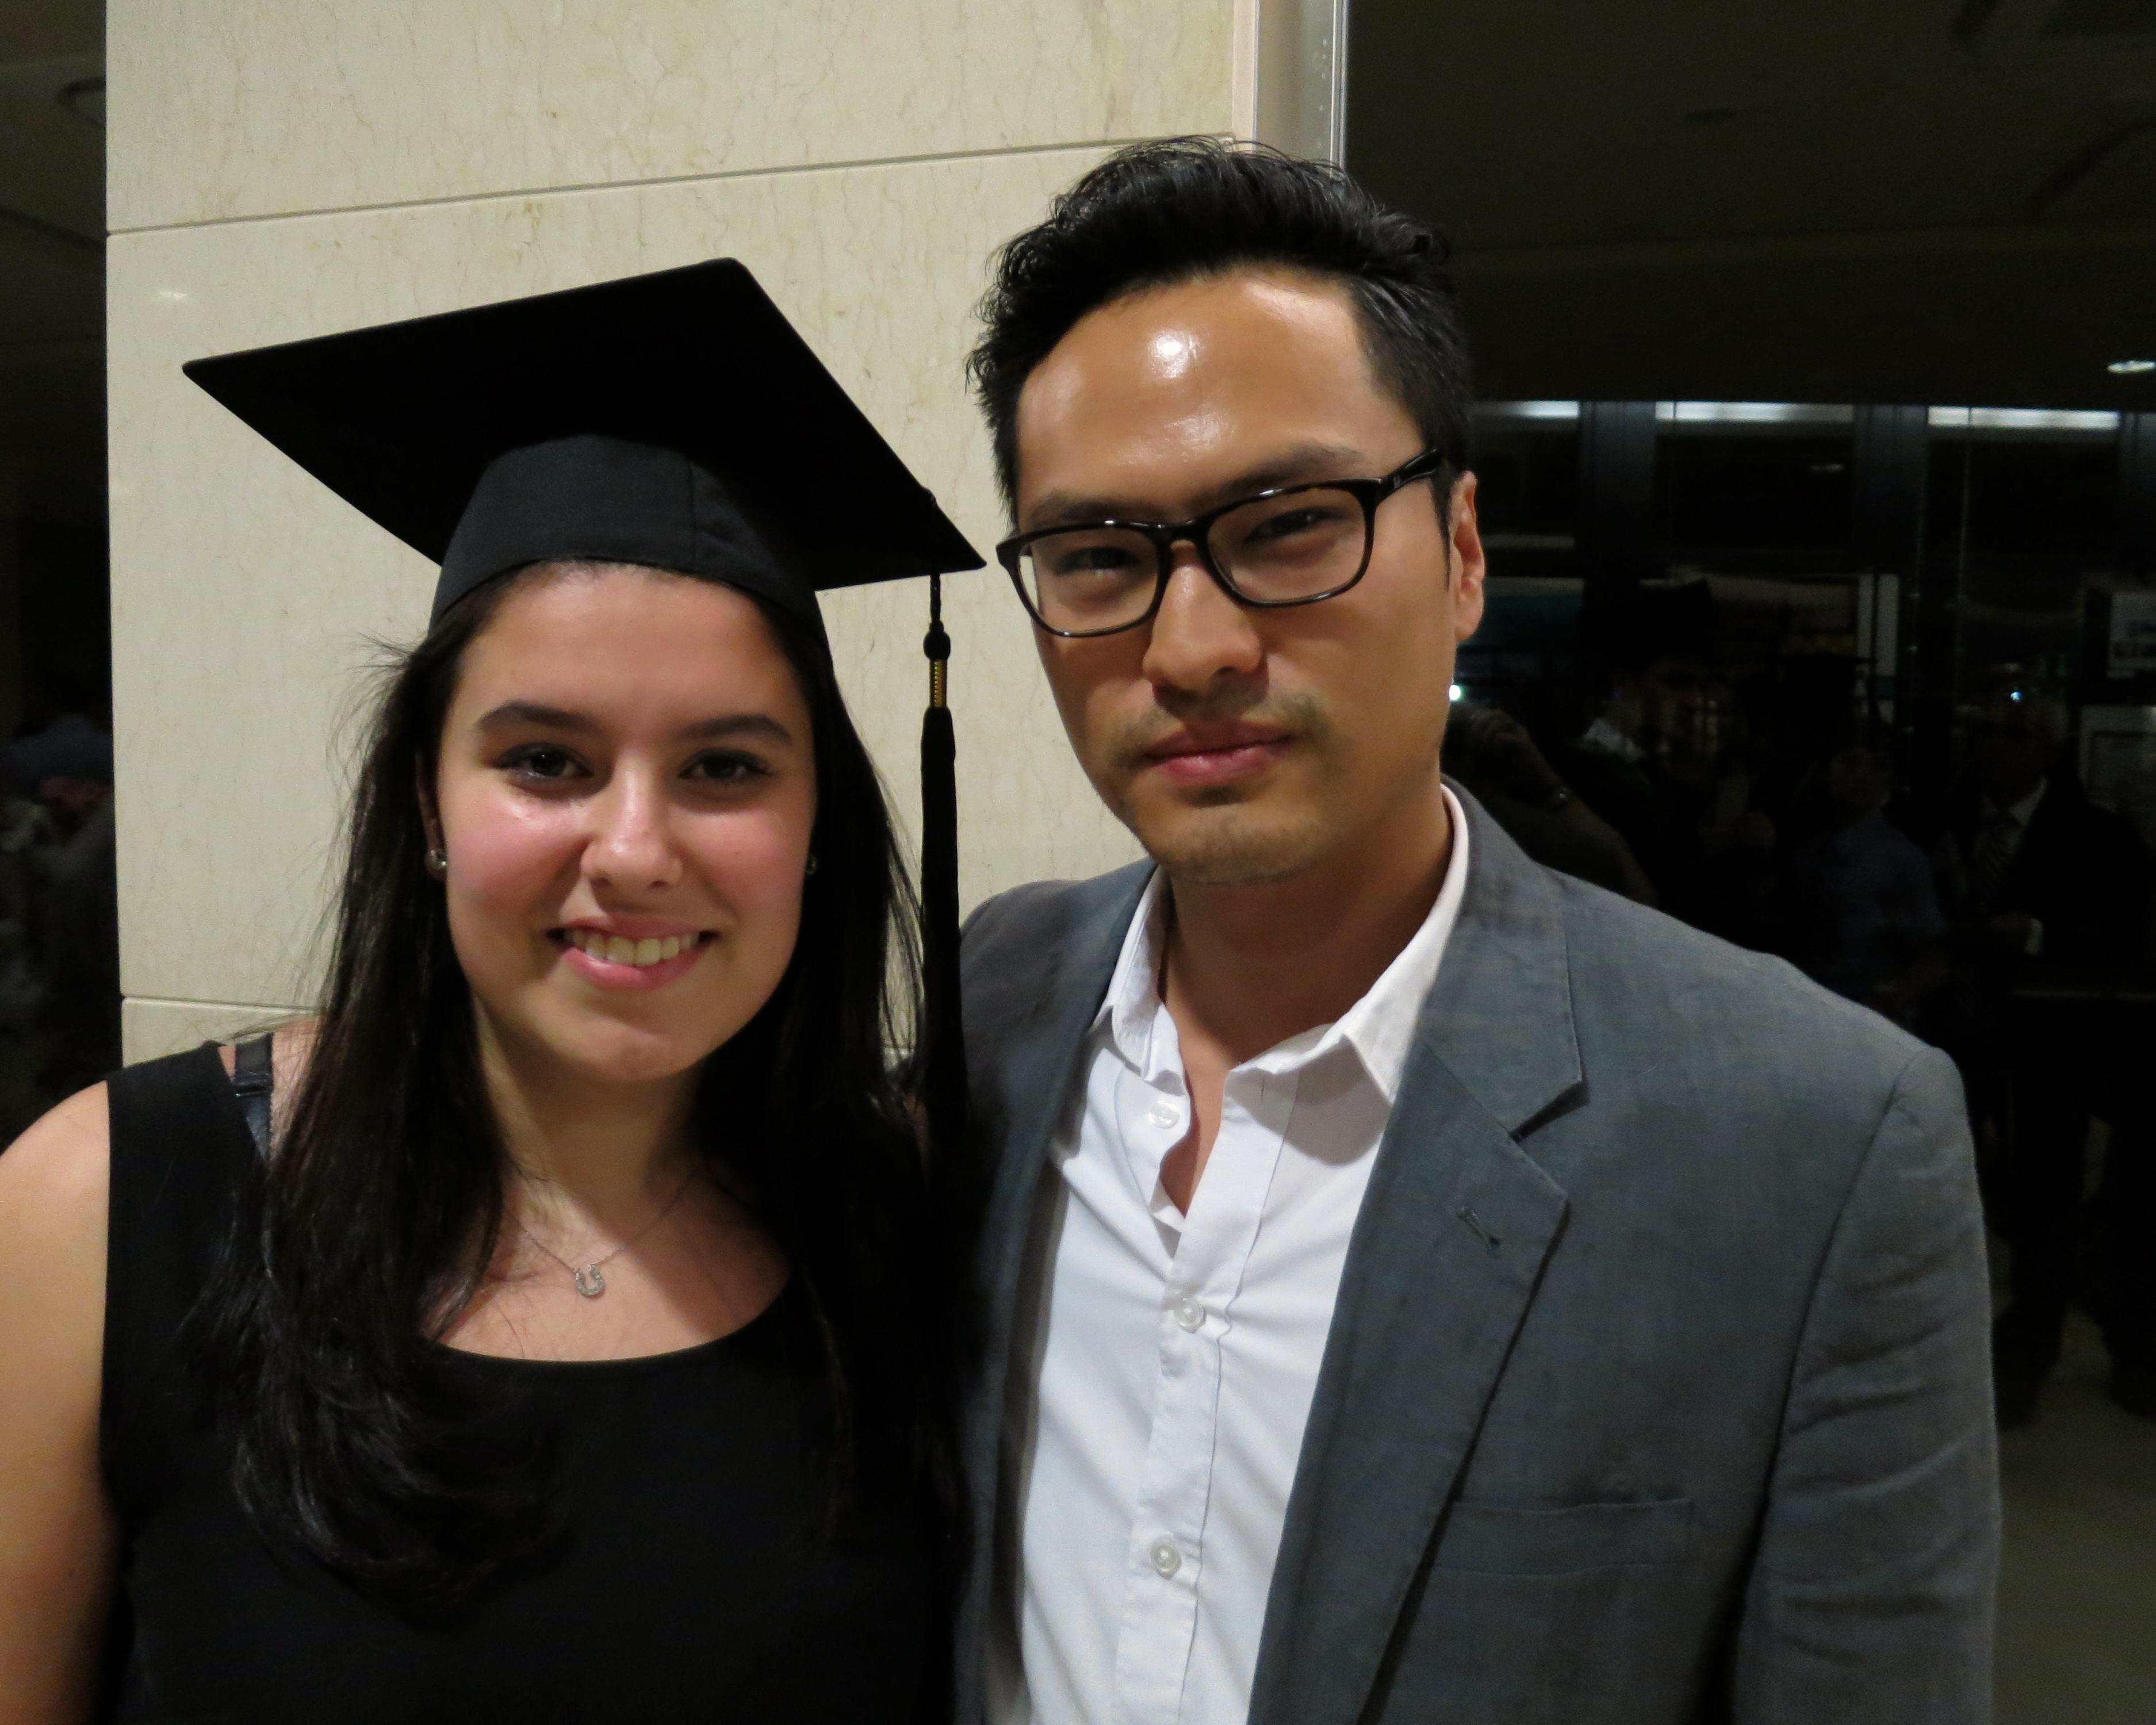 Tutor Ken with Luana Elia